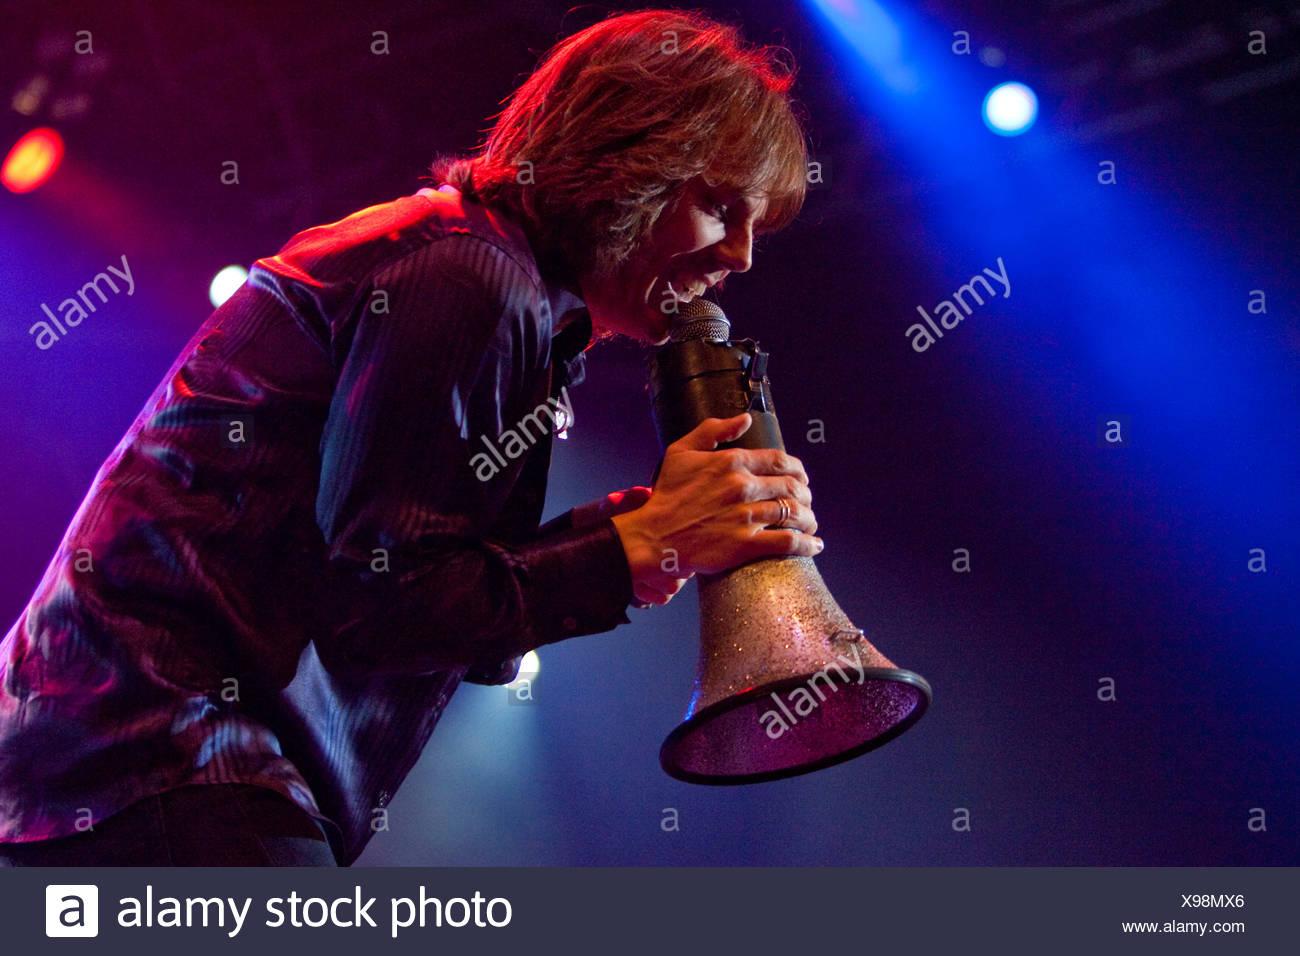 Joey Tempest Stock Photos & Joey Tempest Stock Images - Alamy